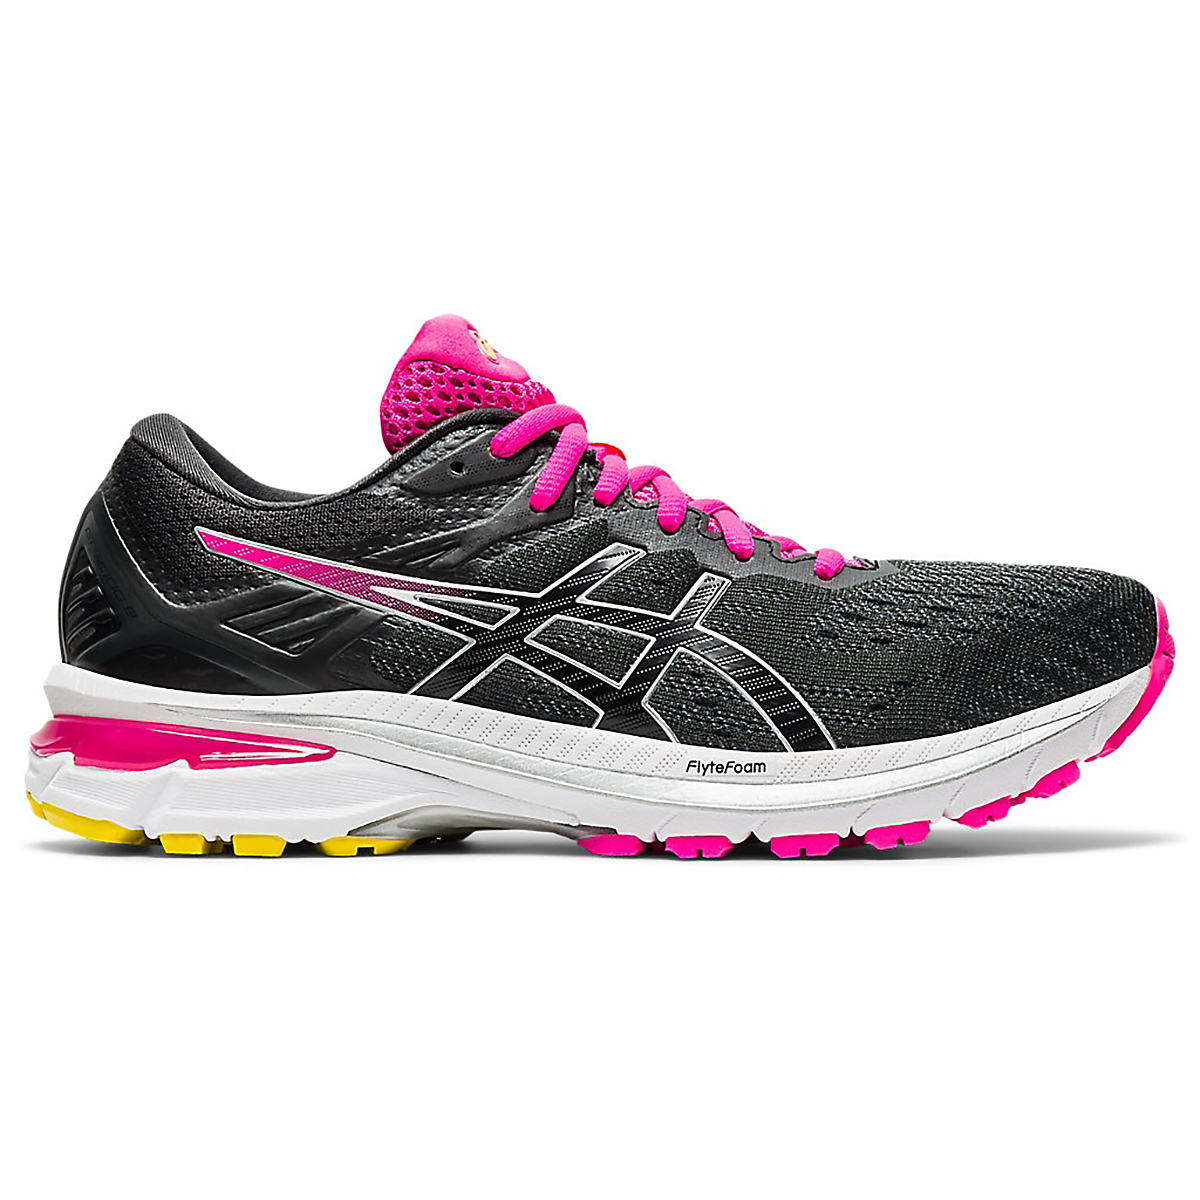 Women's Asics GT-2000 9 Running Shoe - Color: Graphite Grey/Black - Size: 5 - Width: Regular, Graphite Grey/Black, large, image 1